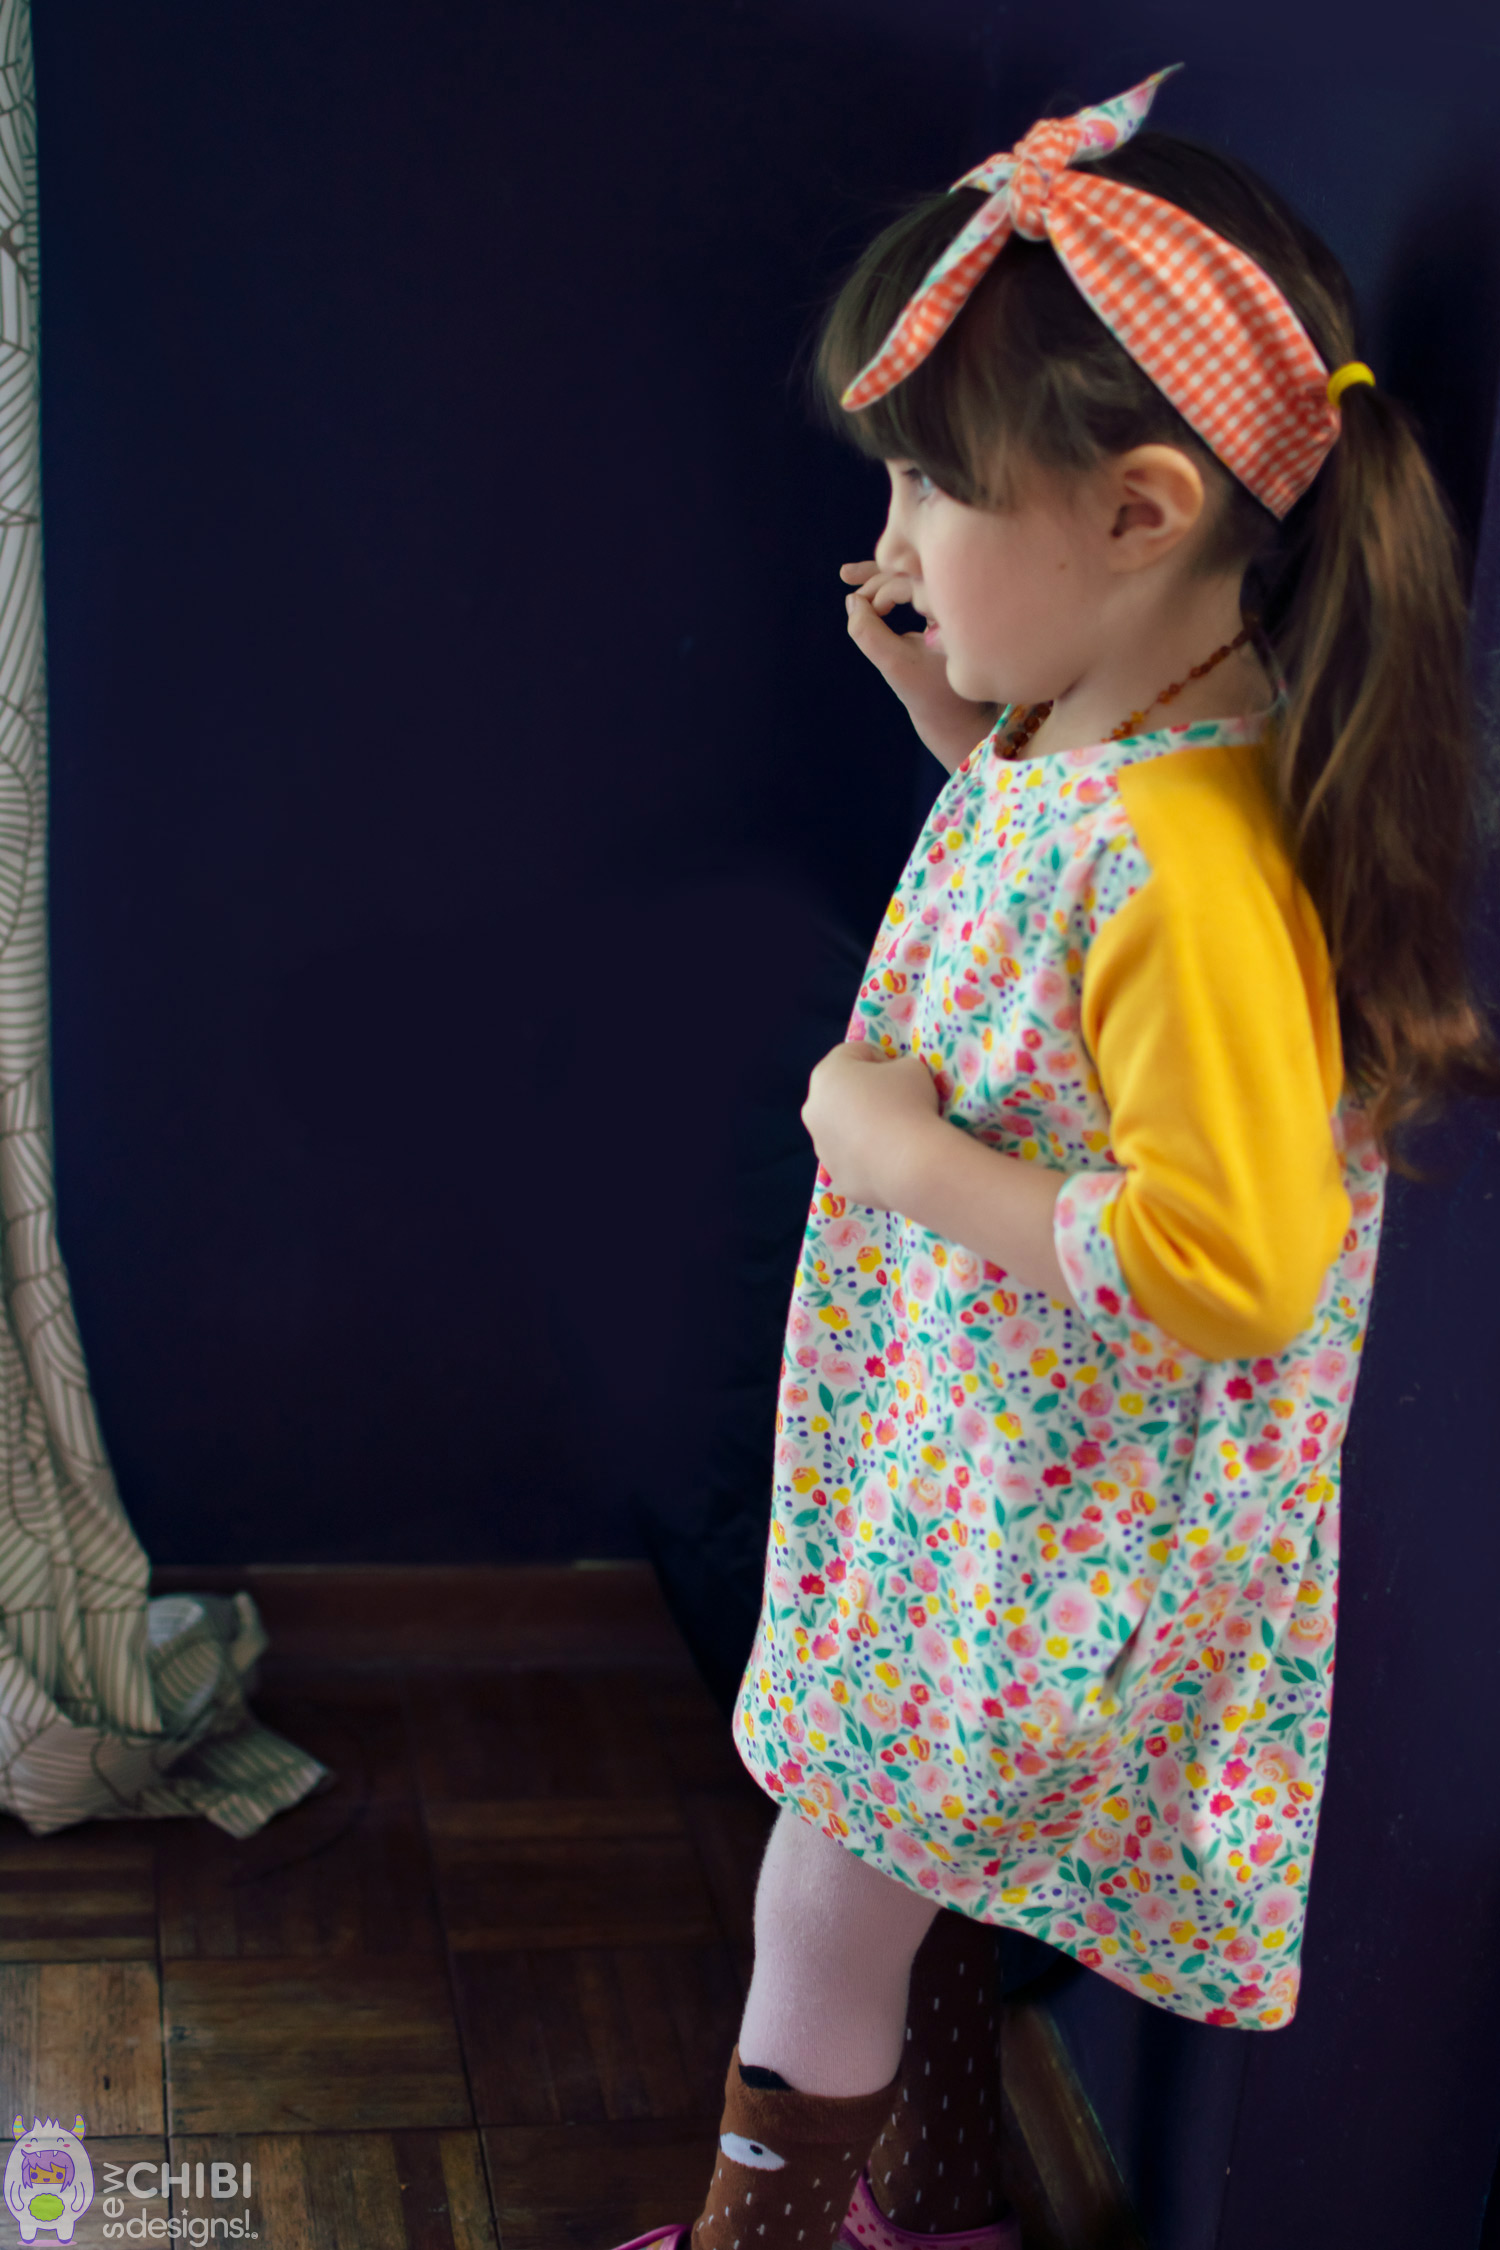 the UpBeet Tee & Dress